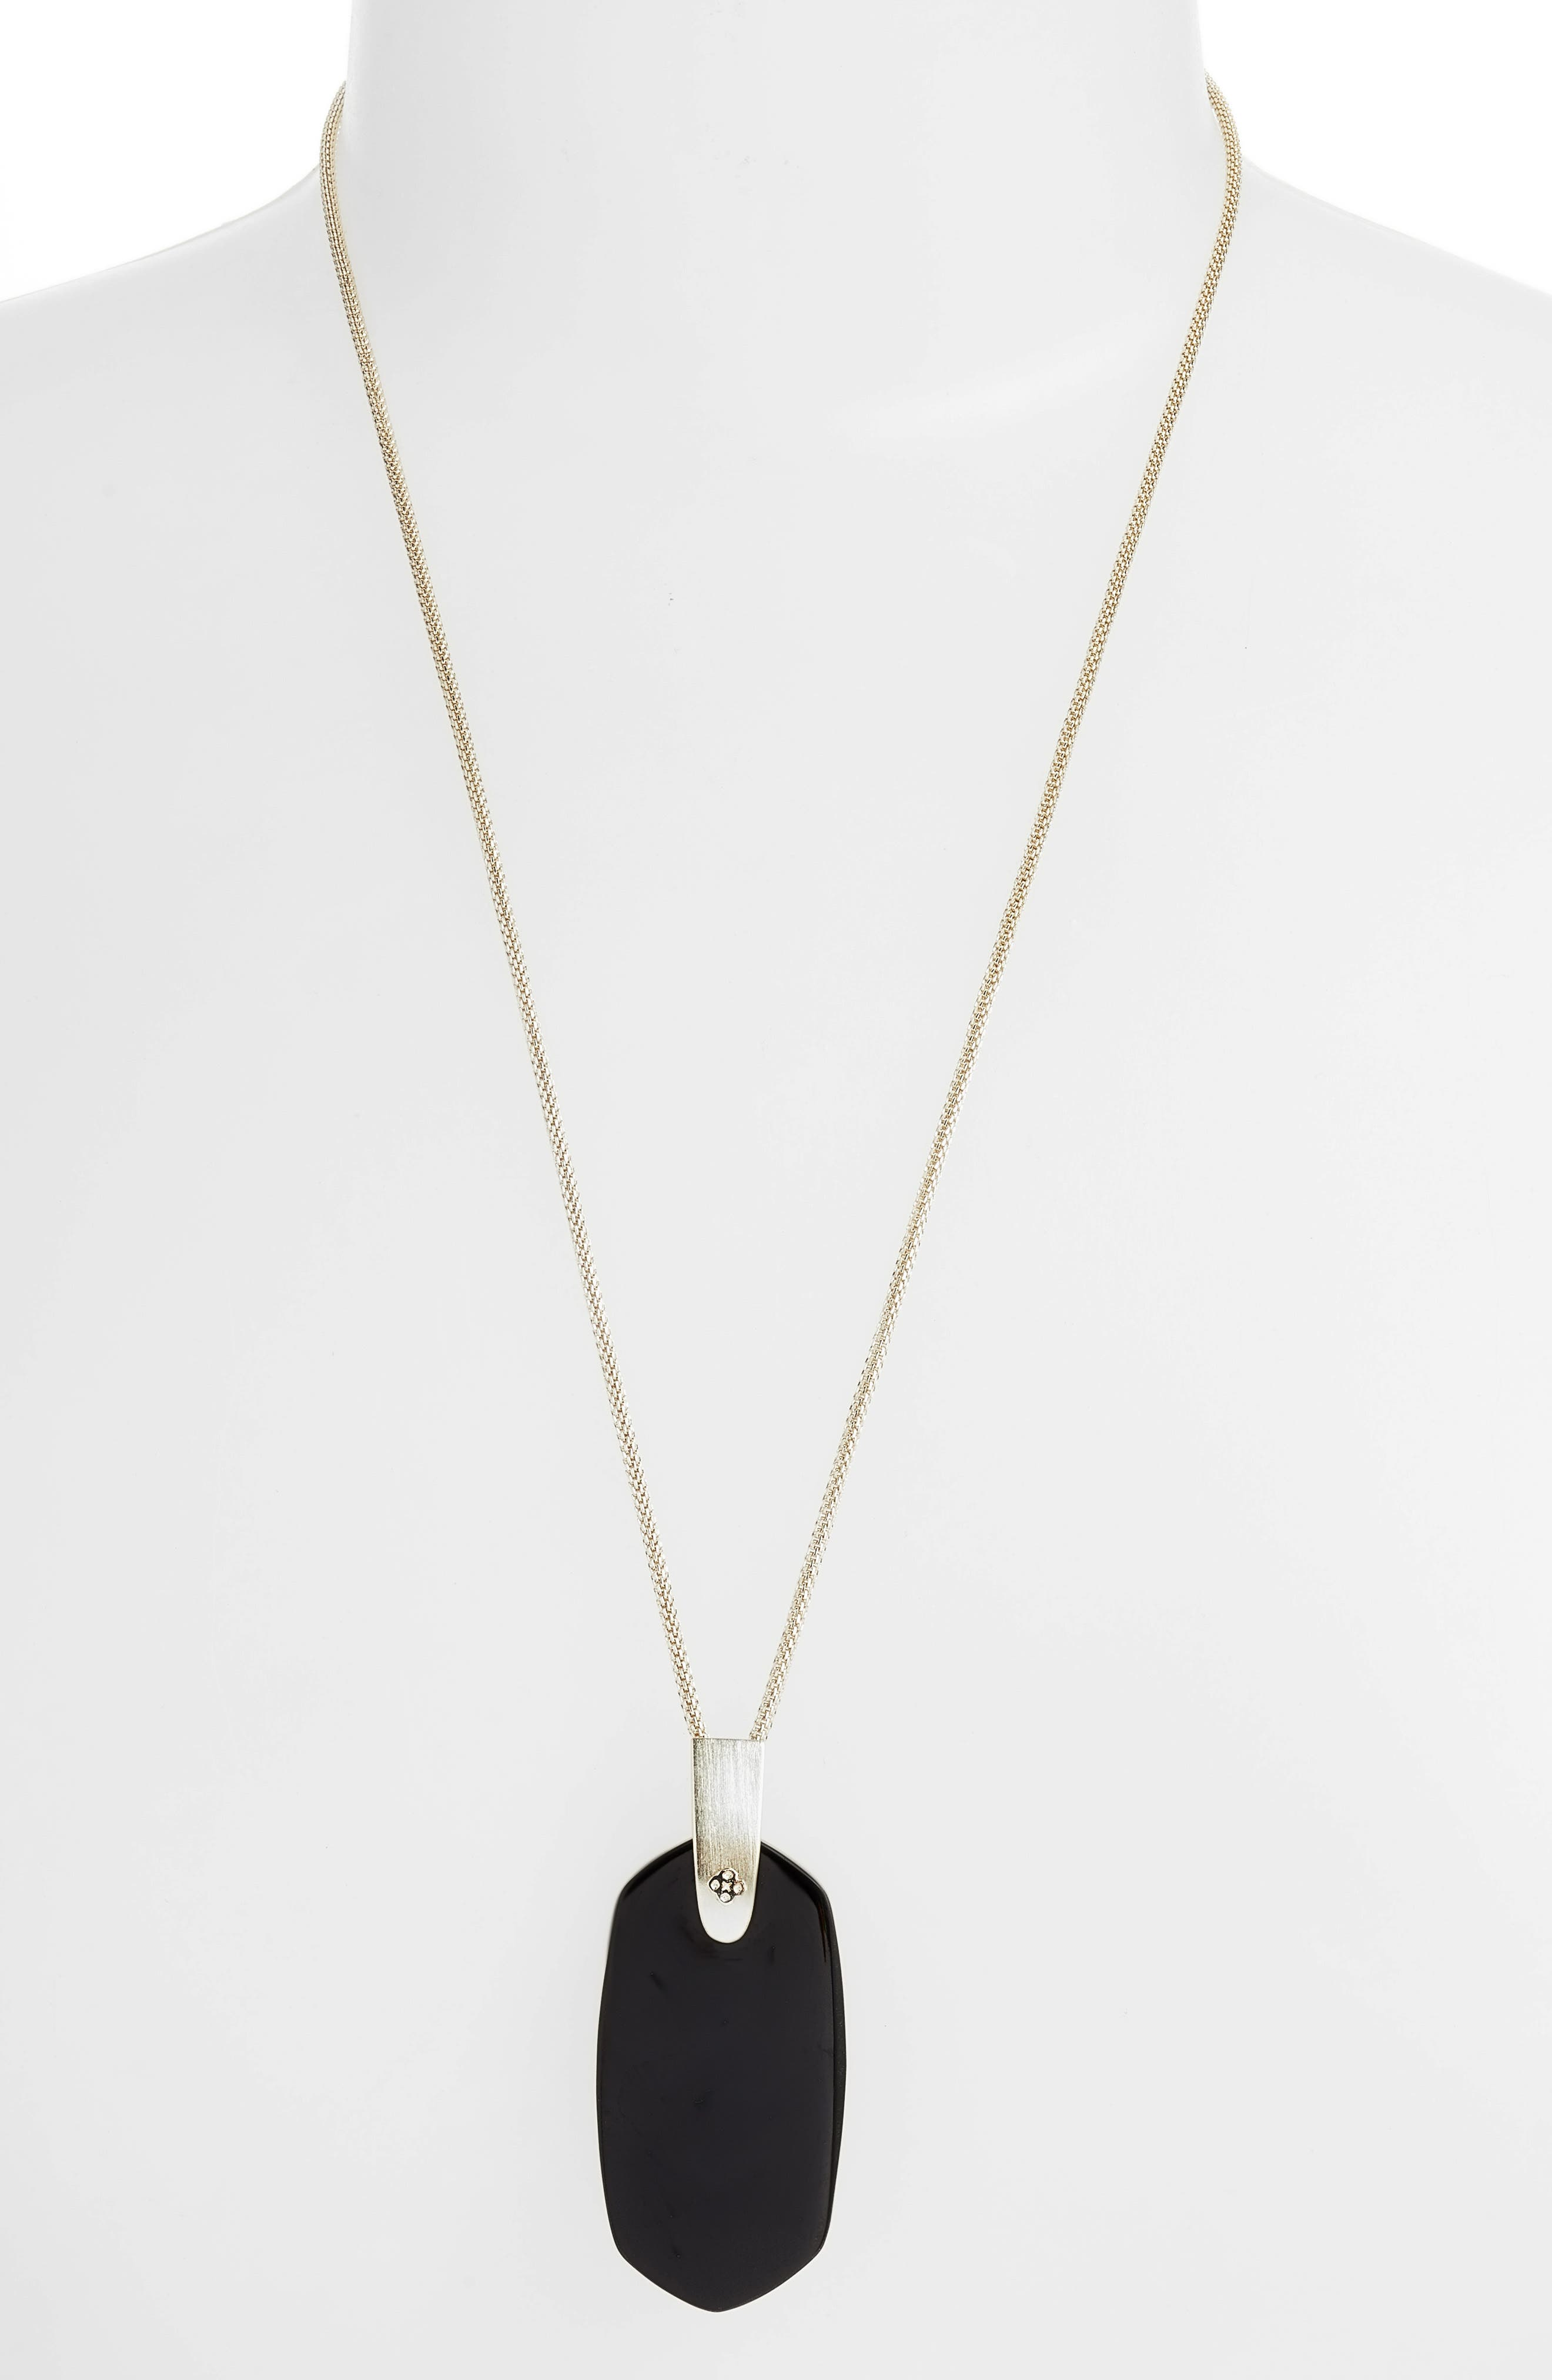 KENDRA SCOTT, Inez Pendant Necklace, Main thumbnail 1, color, BLACK/ GOLD